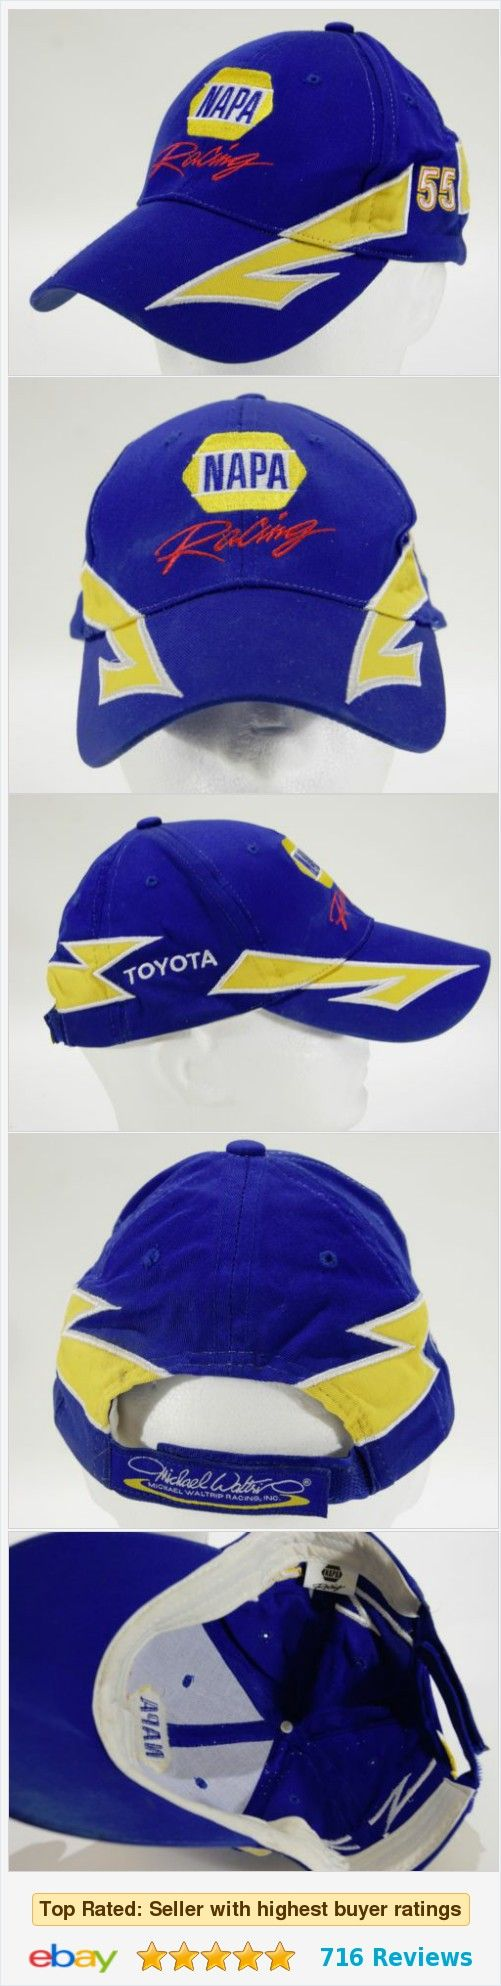 Nascar NAPA Toyota Racing Ball Cap Michael Waltrip Blue Adjustable Adult Hat